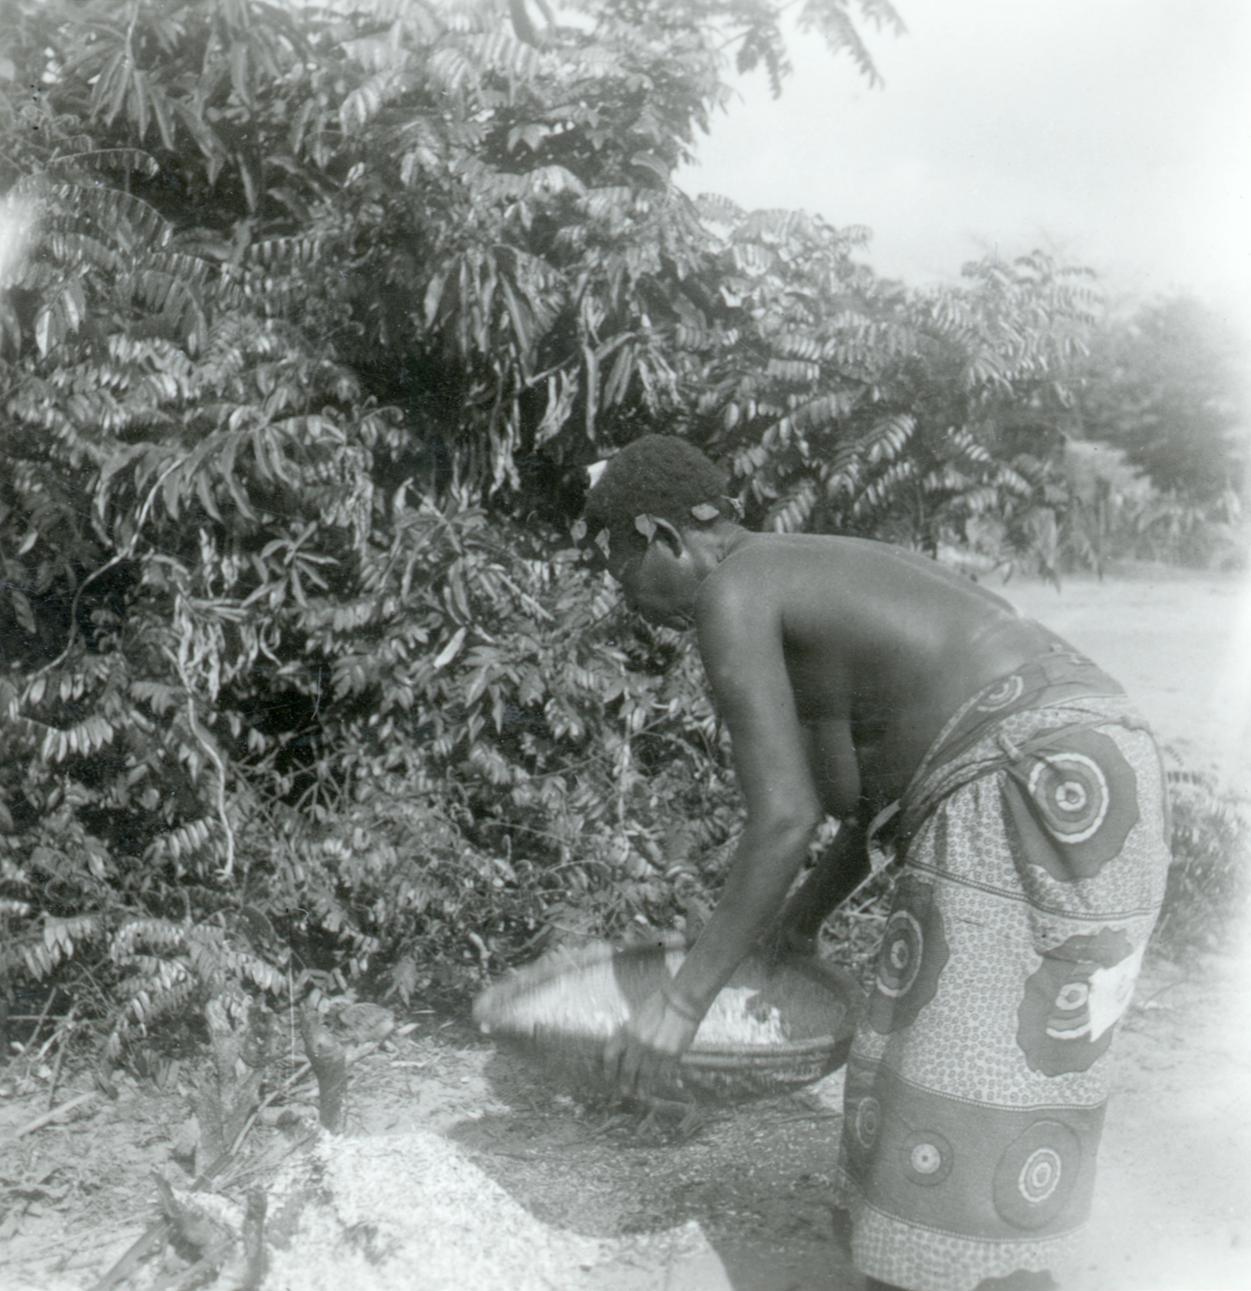 Sifting and Winnowing Cassava Flour in a Kuba-Ngongo Village